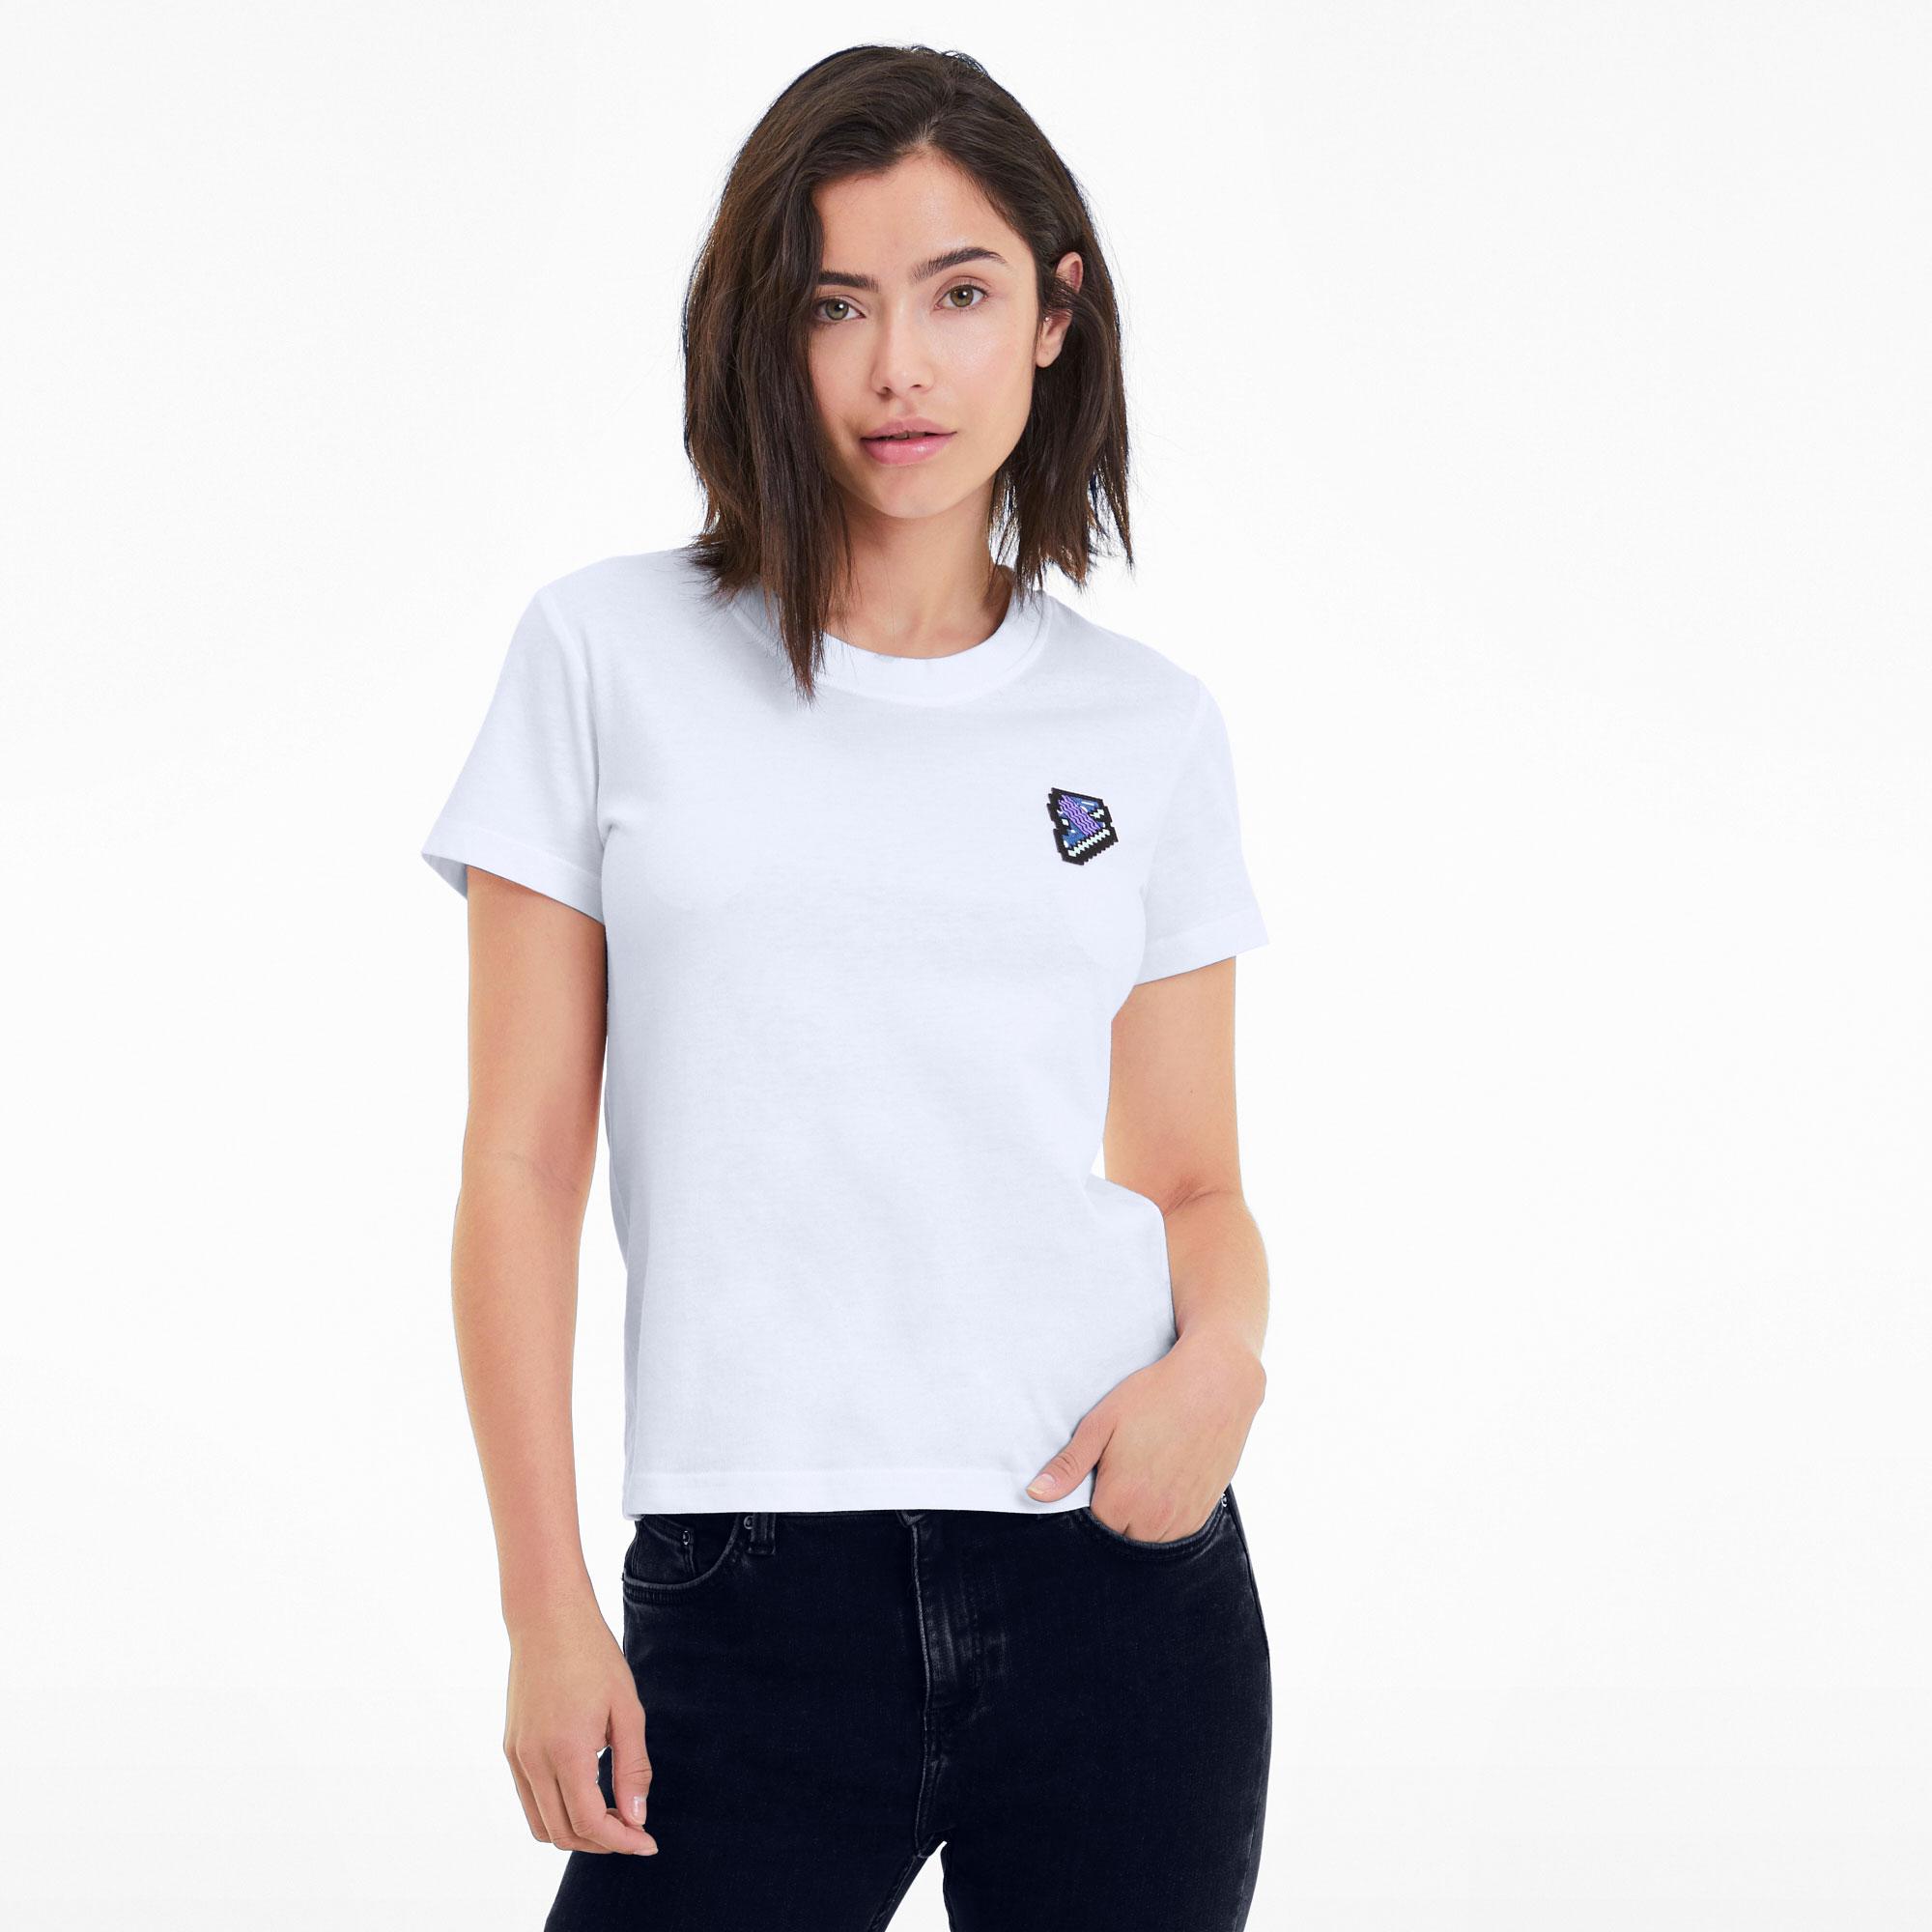 Puma Women's Digital Love Tee Shirt 597068-02